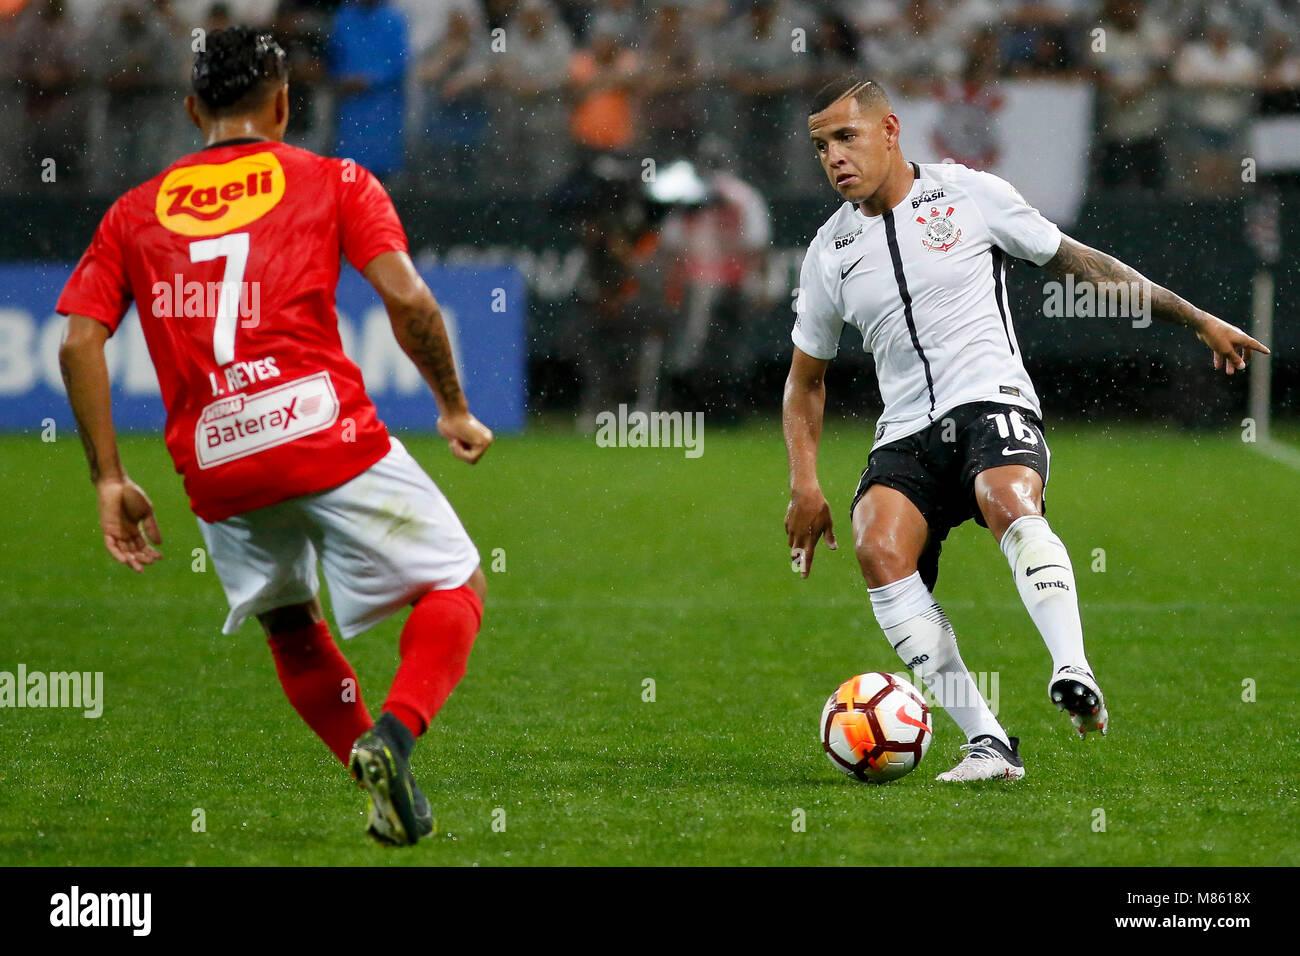 Sao Paulo Sp  Corinthians X Deportivo Lara Sidcley During